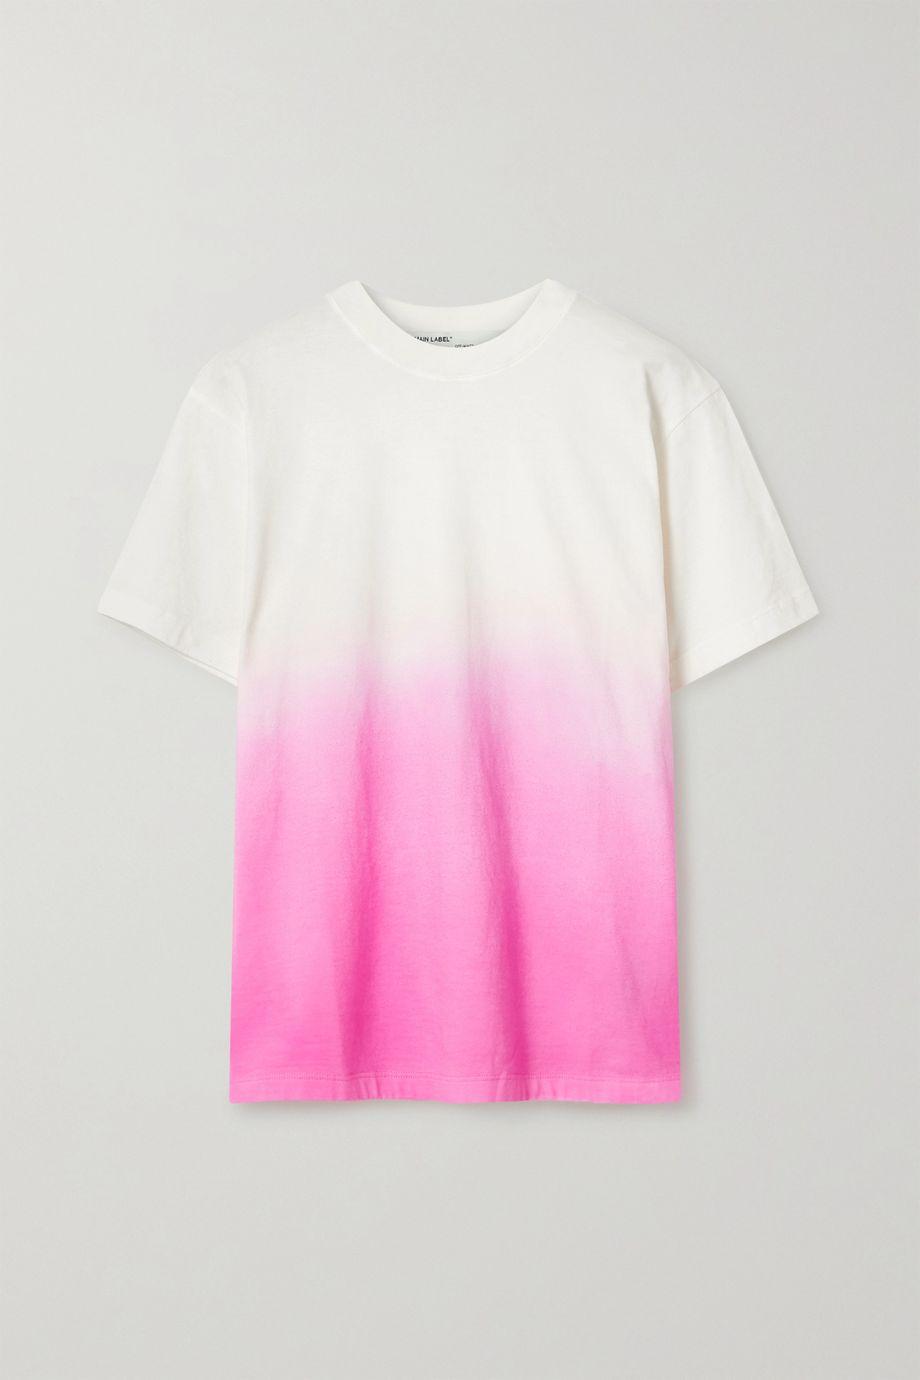 Off-White Embroidered dégradé cotton-blend jersey T-shirt